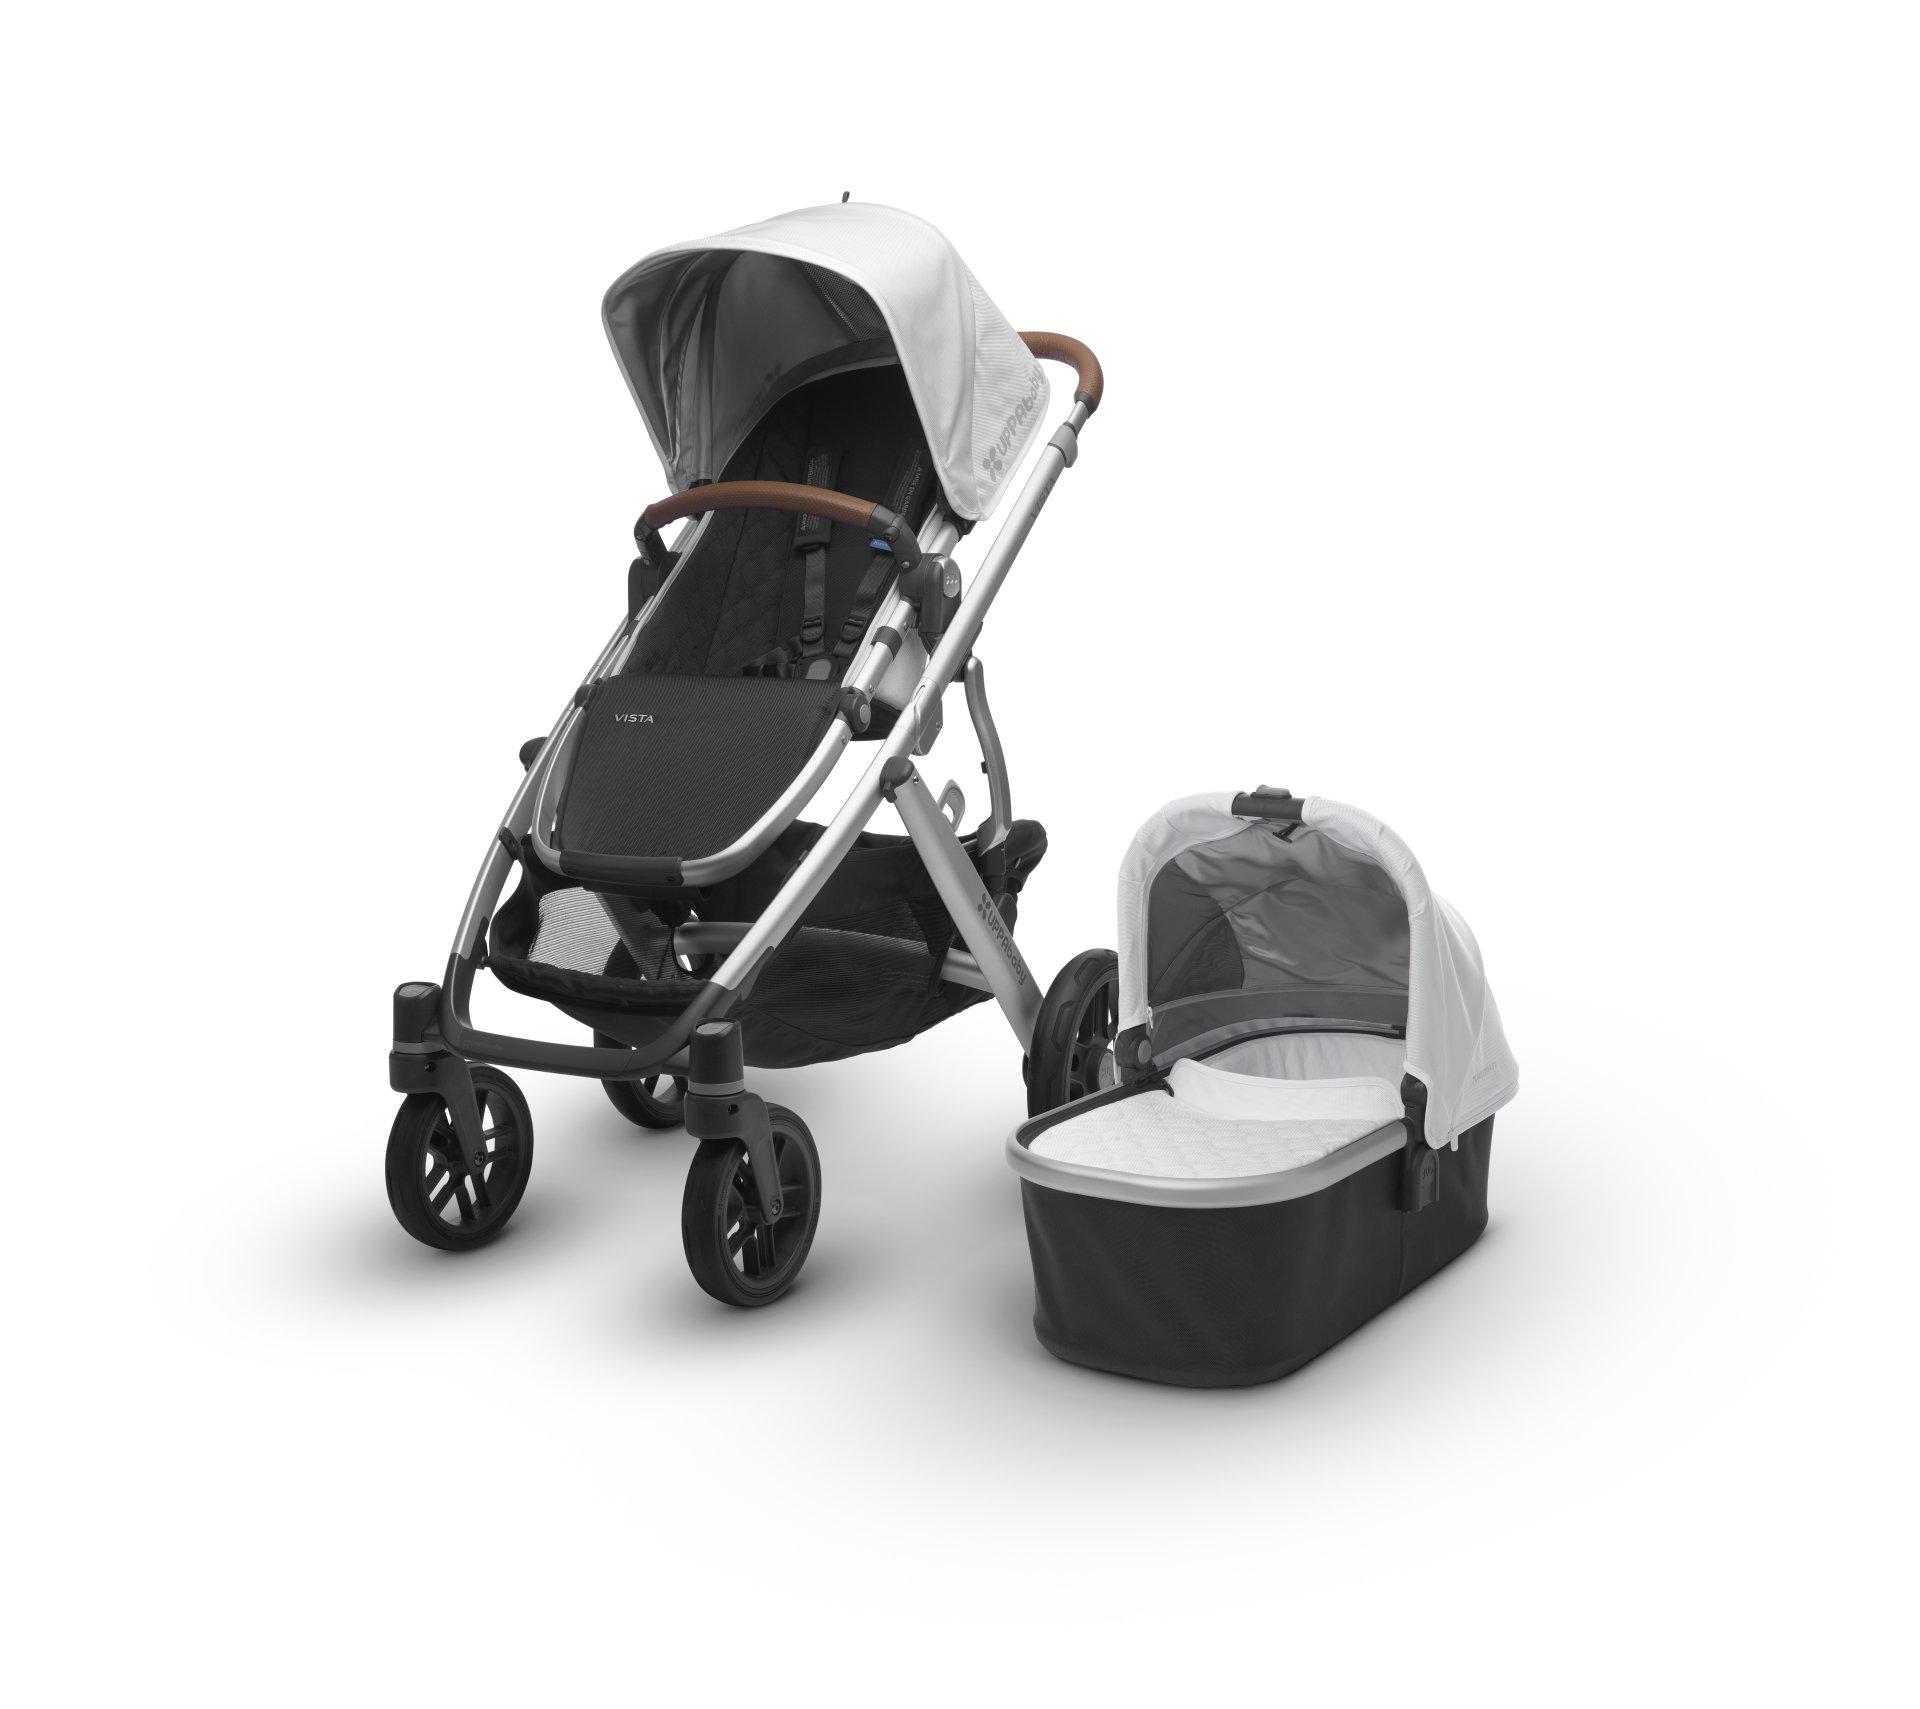 Uppababy Multi-Functional Stroller VISTA 2019 LOIC - Buy at